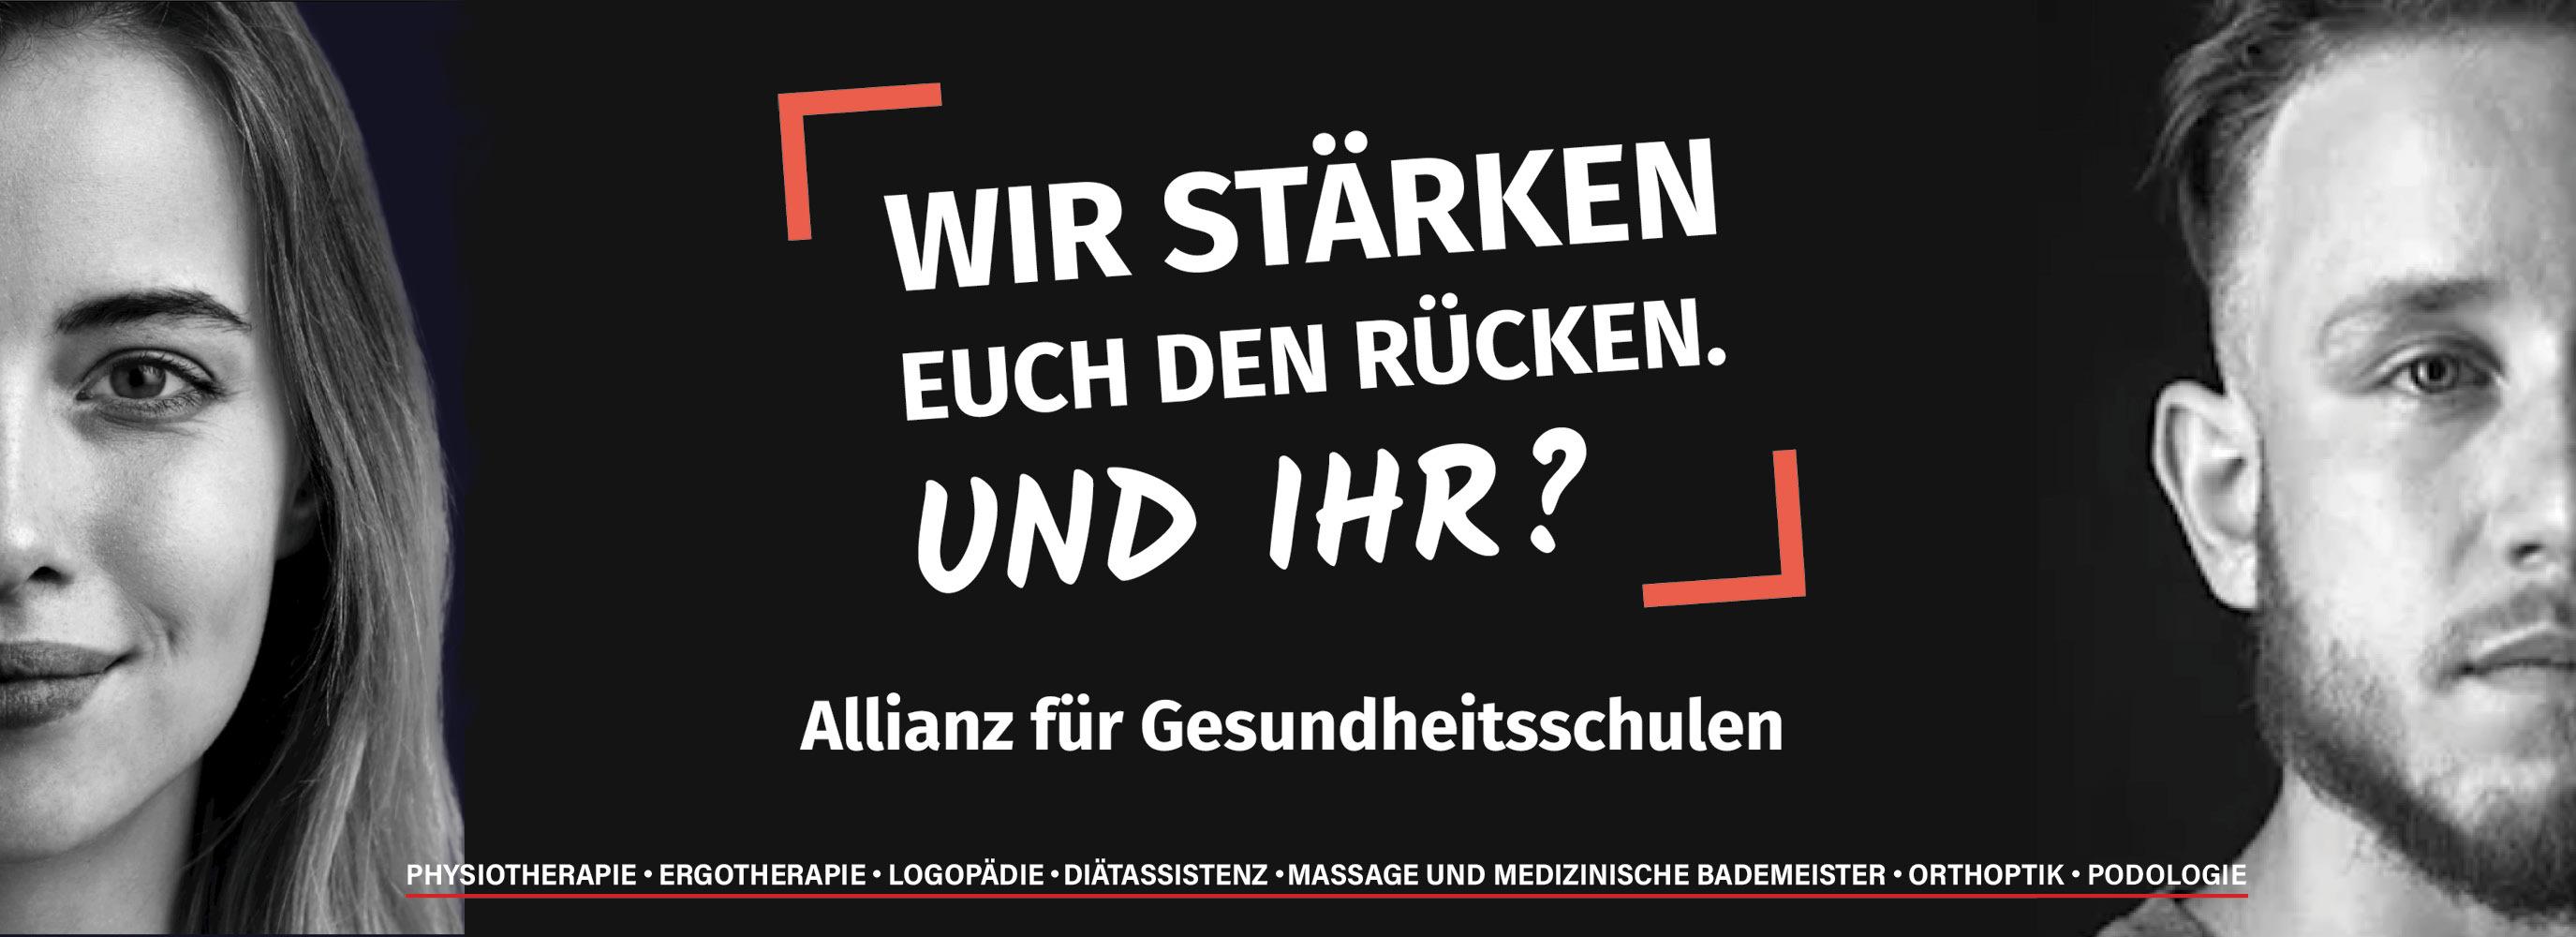 Banner_Kampagne_Gesundheitsberufe_2750x1000px.jpg